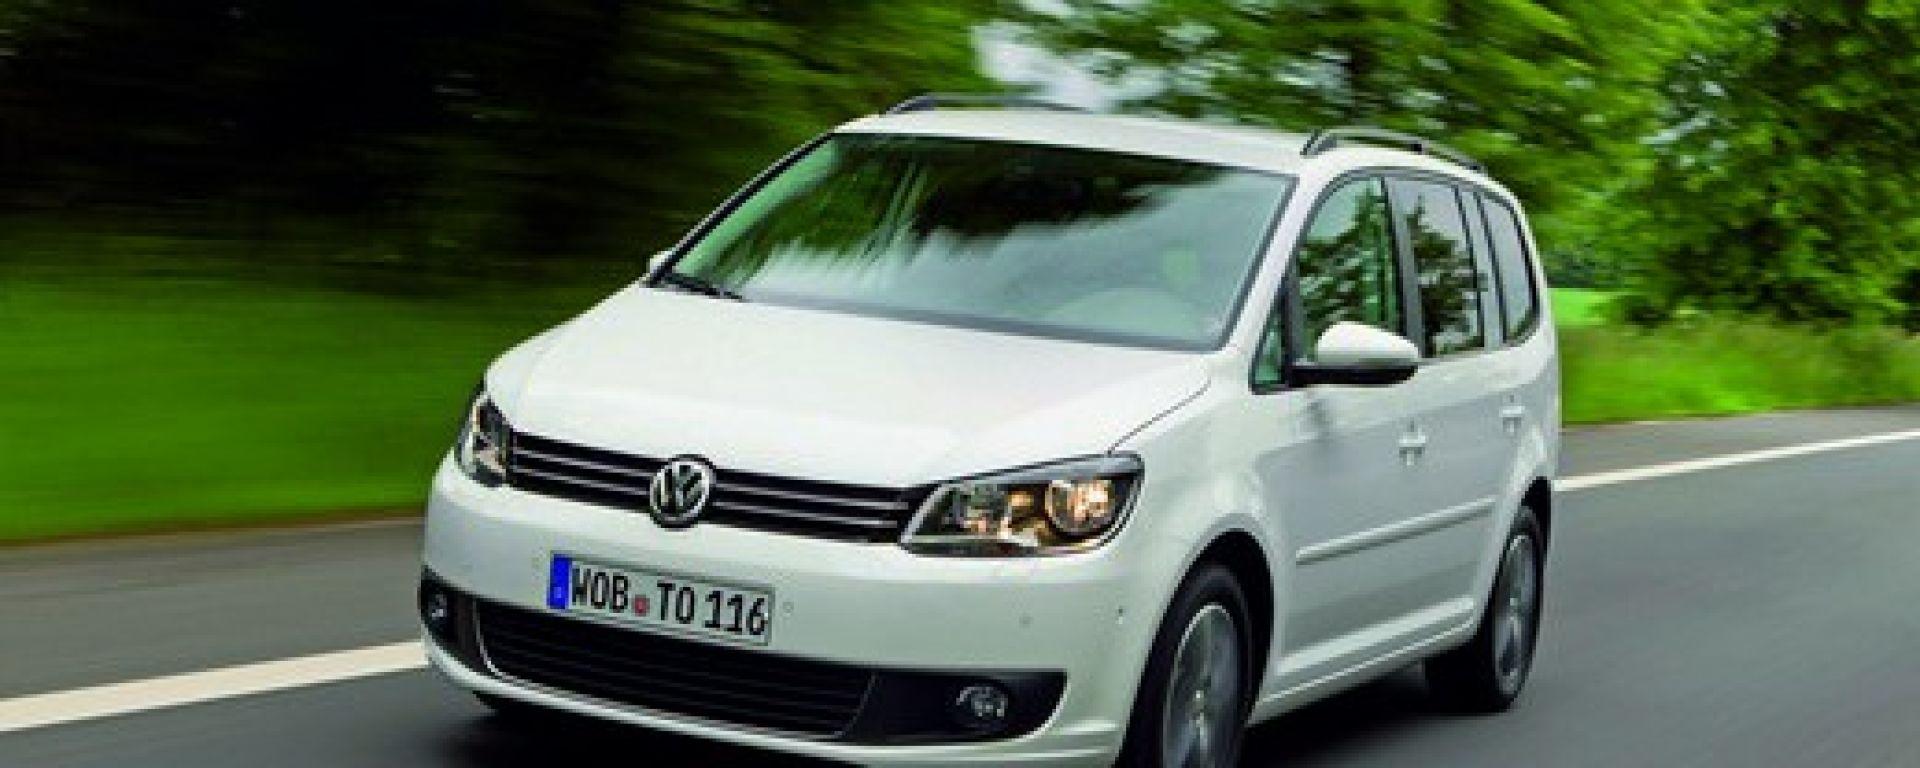 Volkswagen Nuova Touran